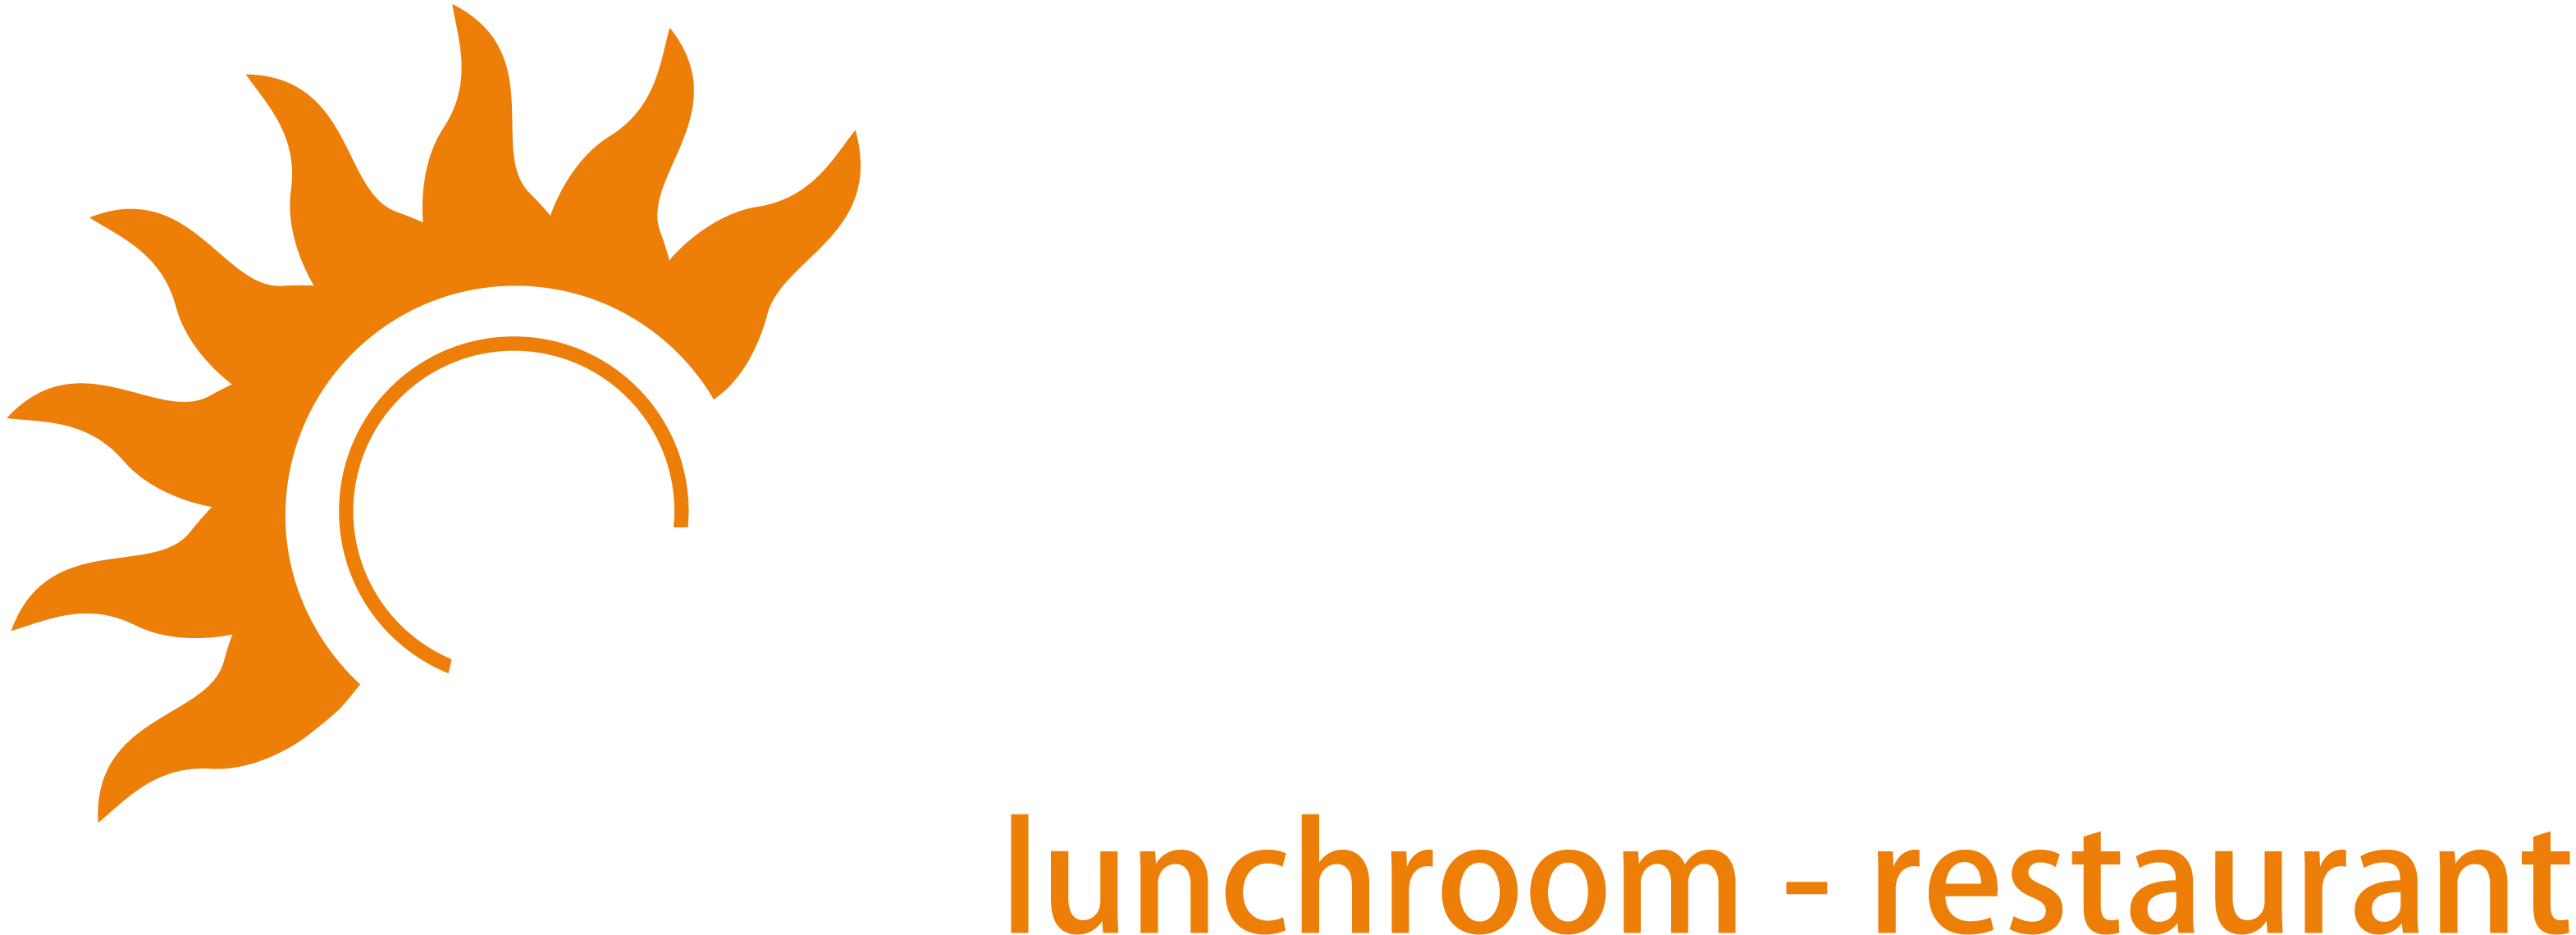 't Zunneke